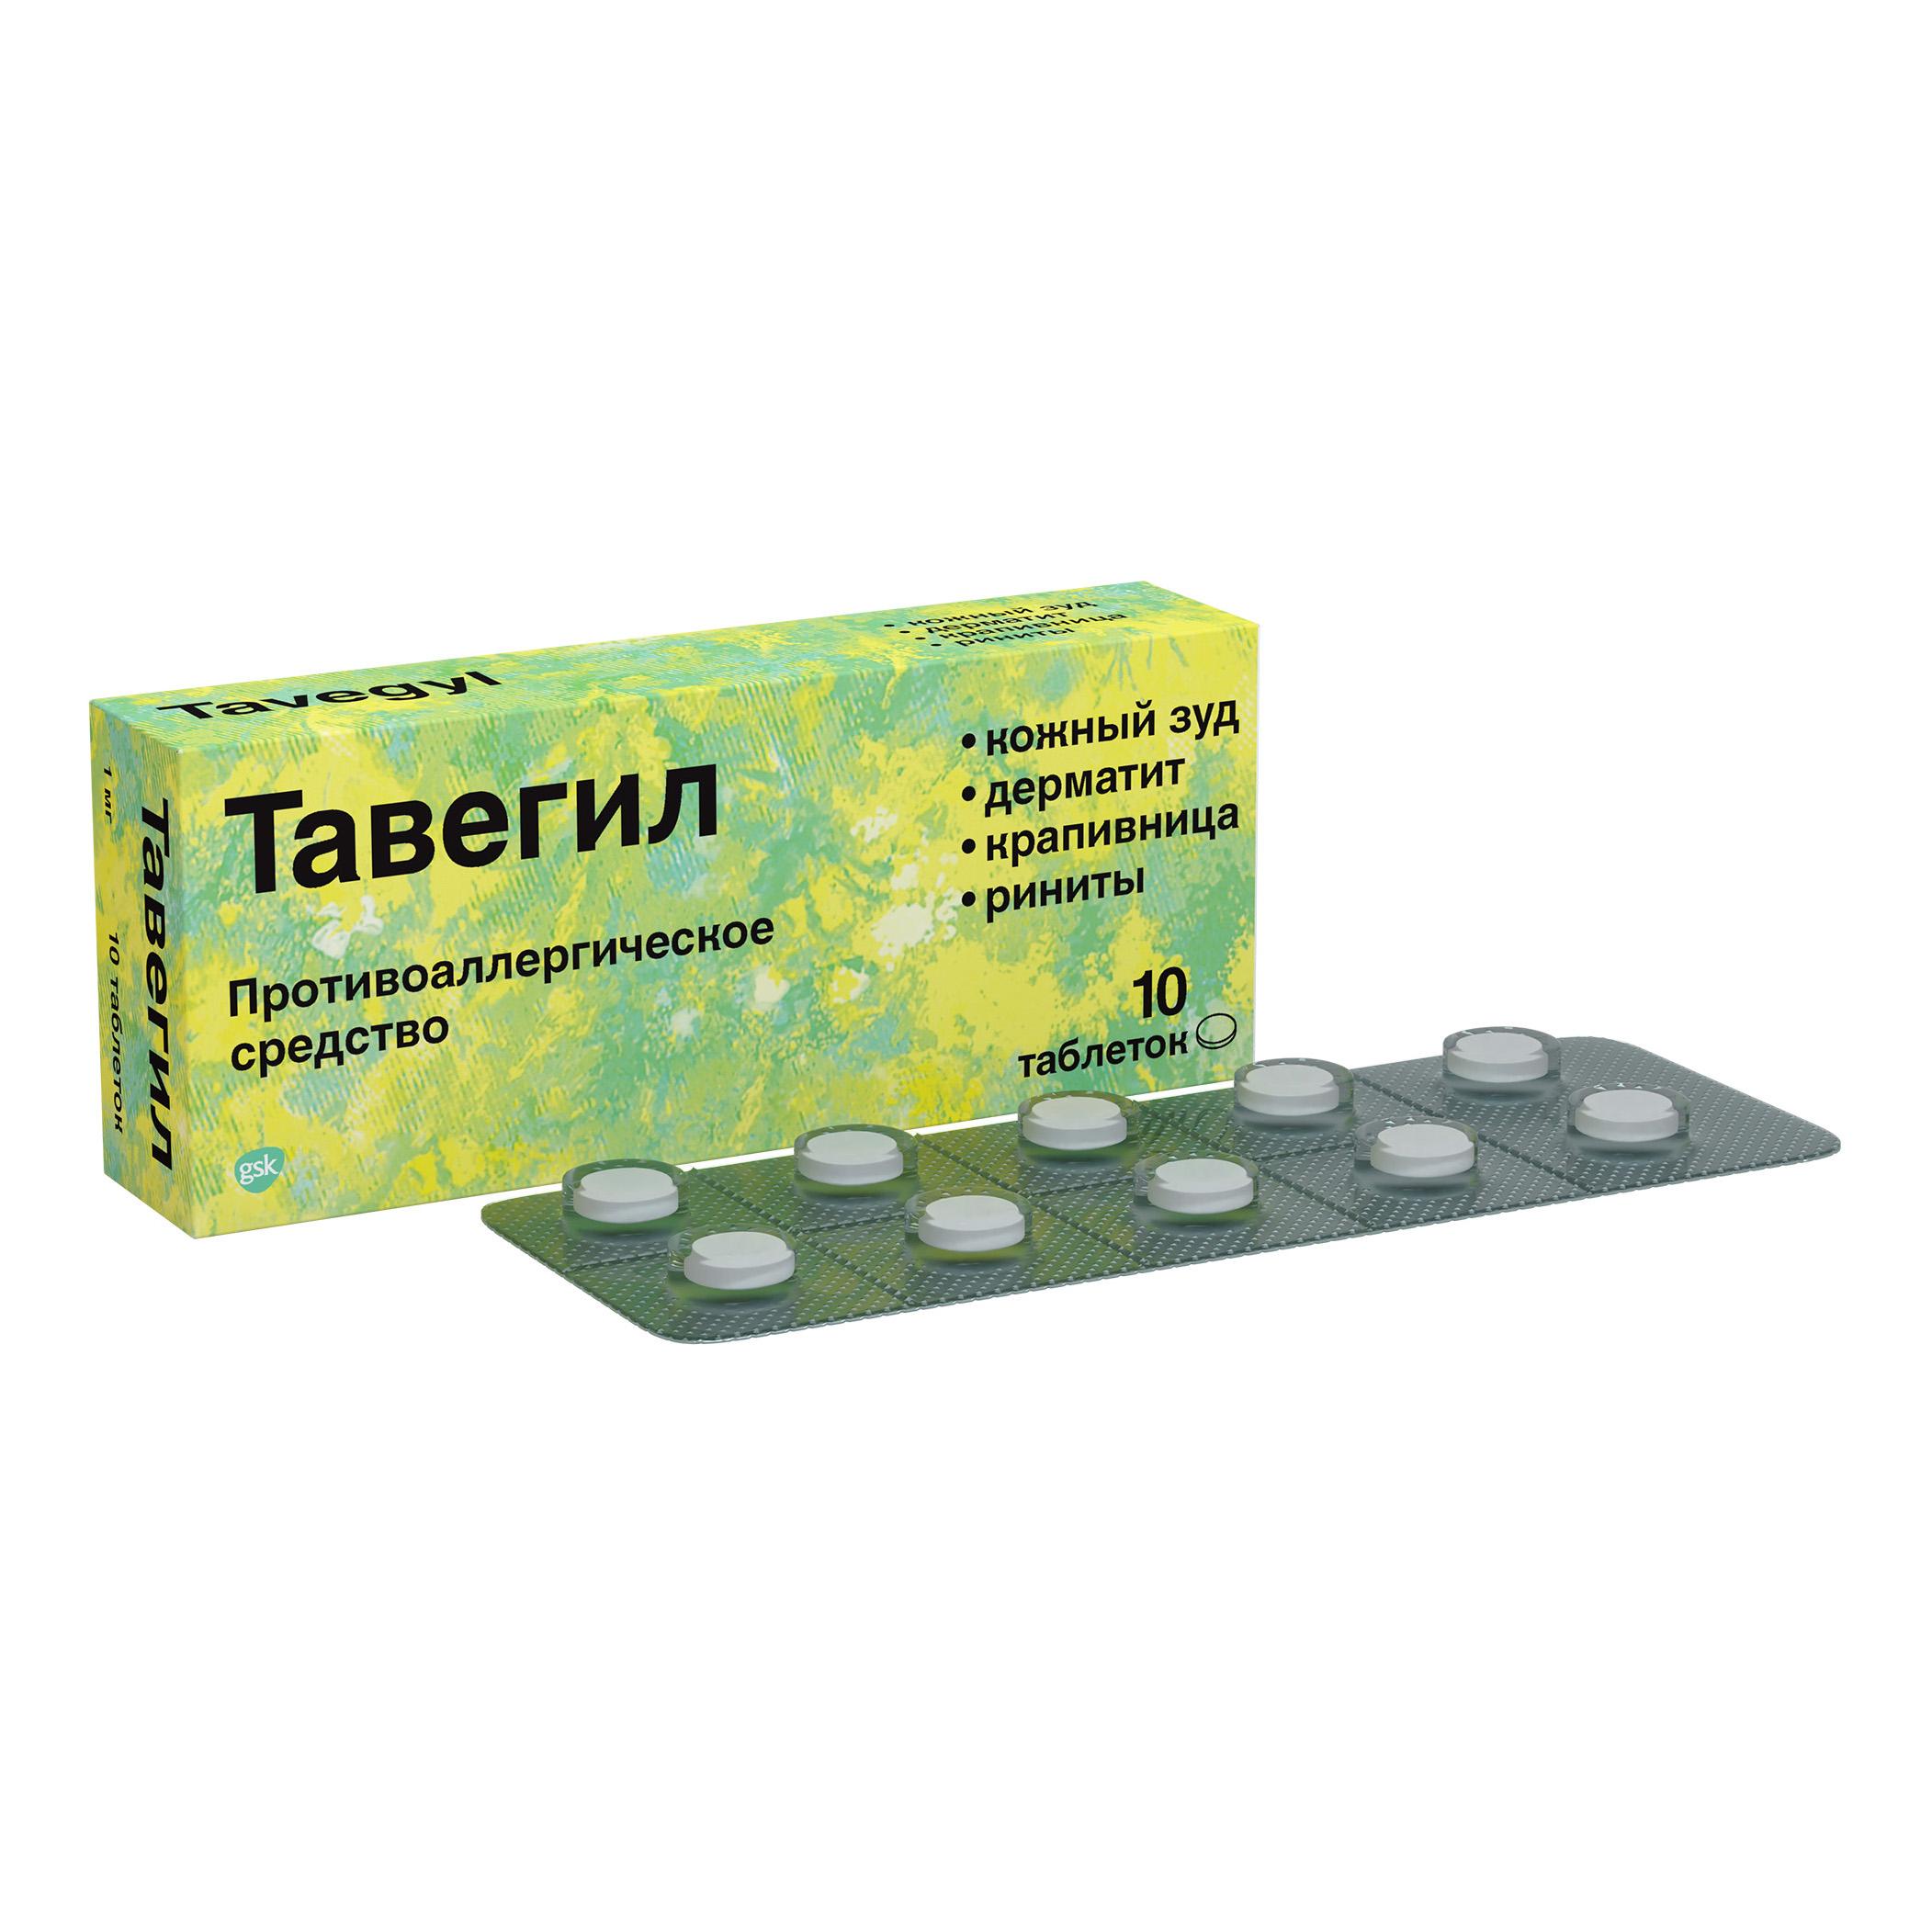 ТАВЕГИЛ таблетки 1 мг 10 шт.